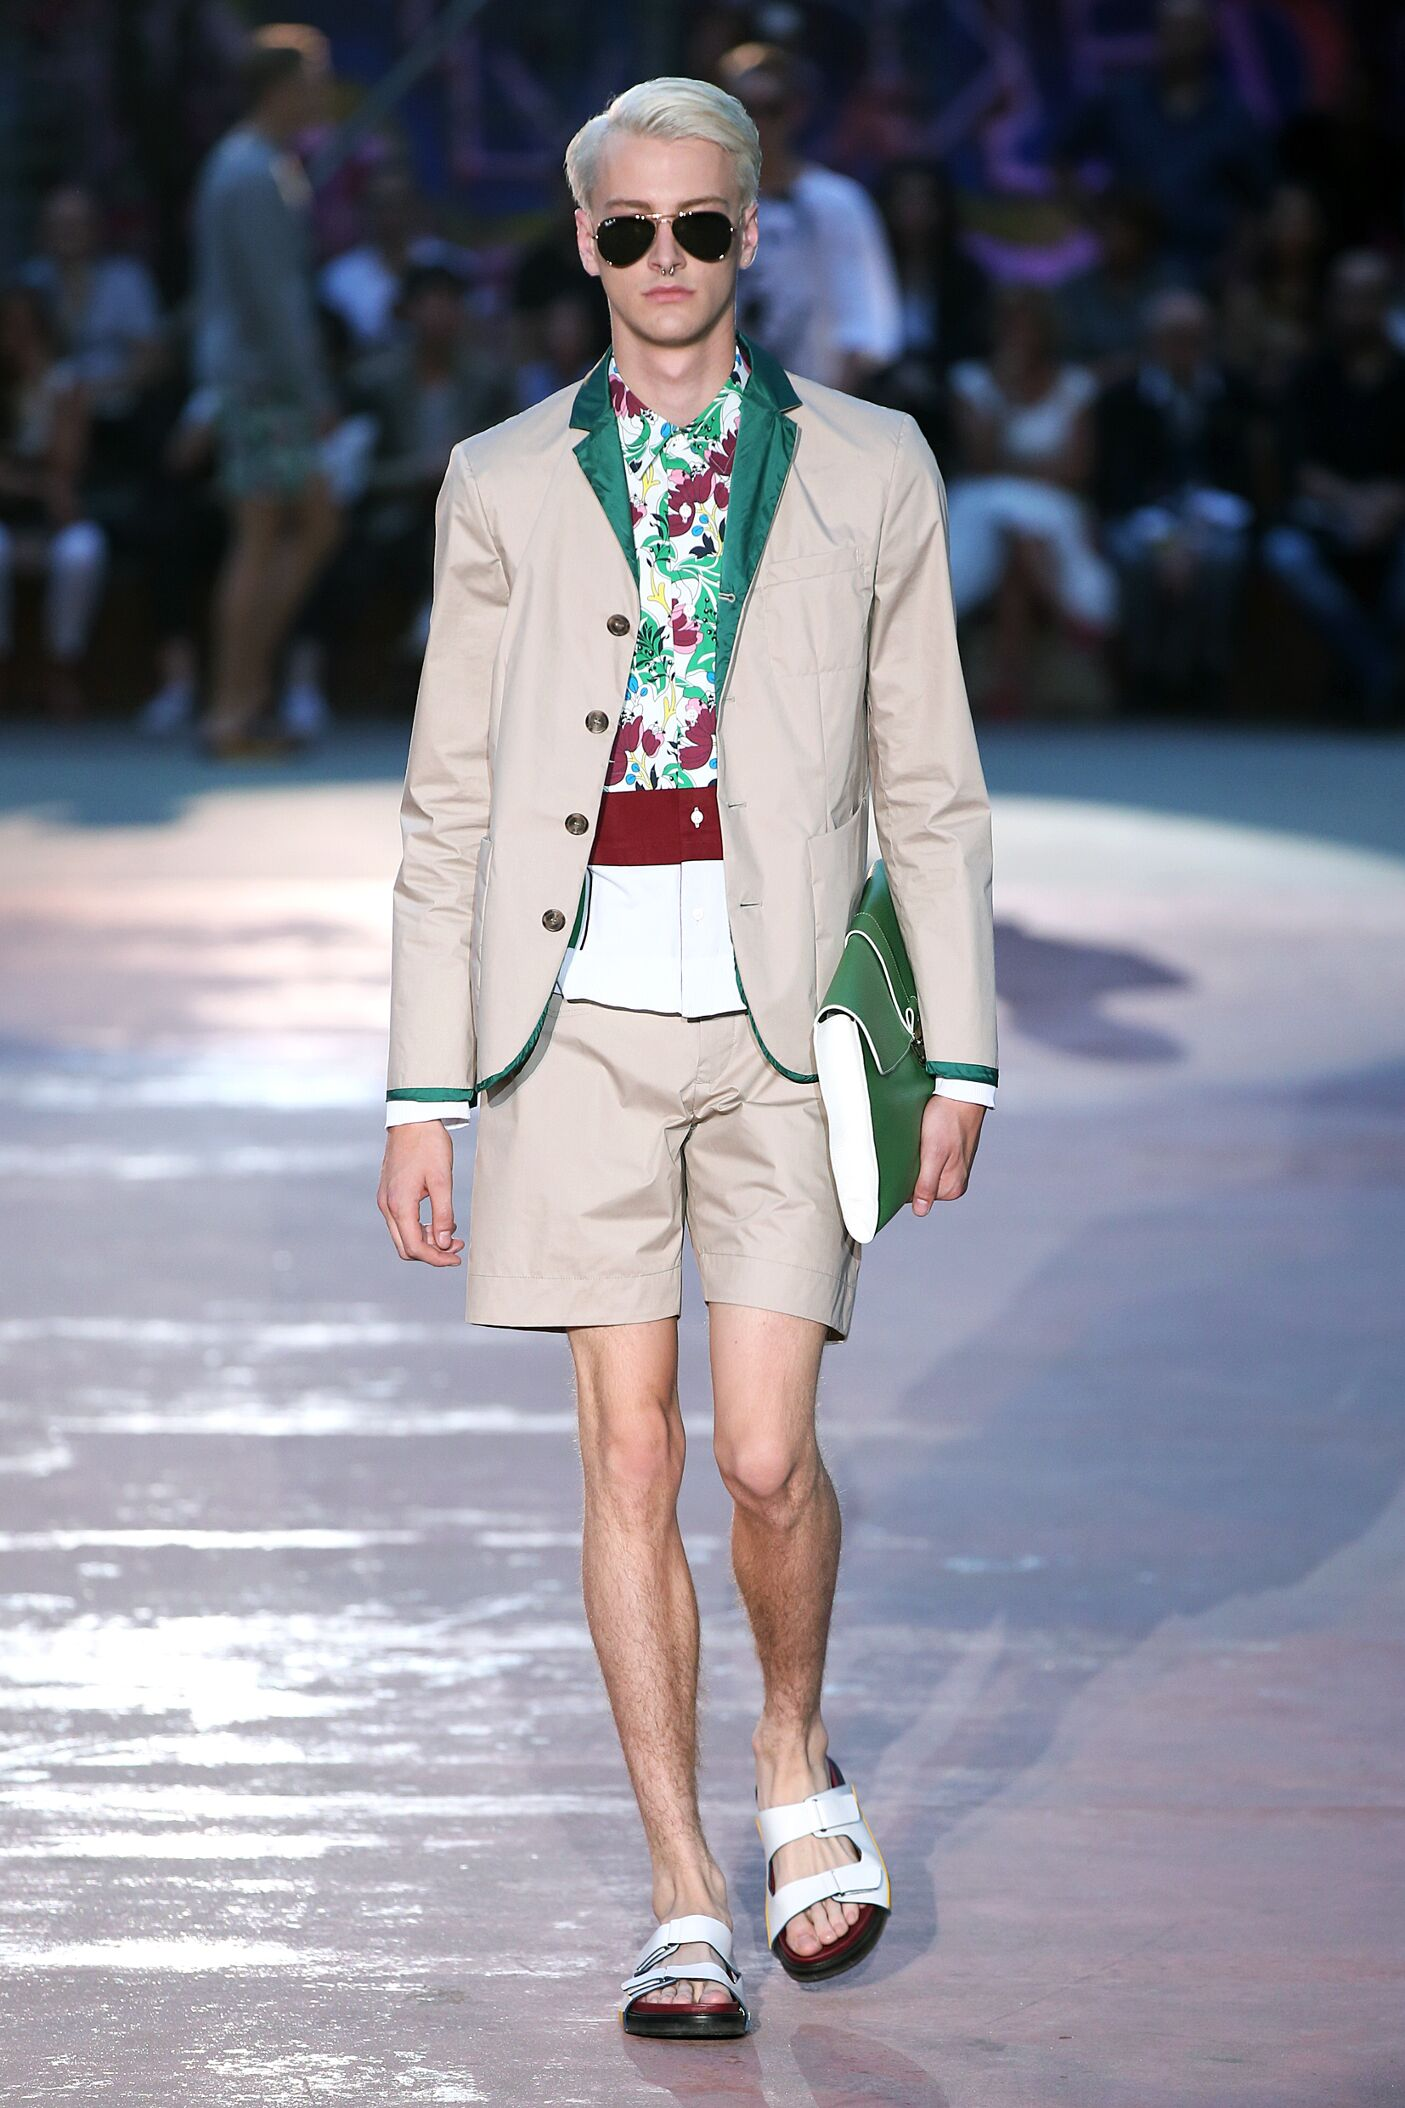 2015 Catwalk Antonio Marras Man Fashion Show Summer